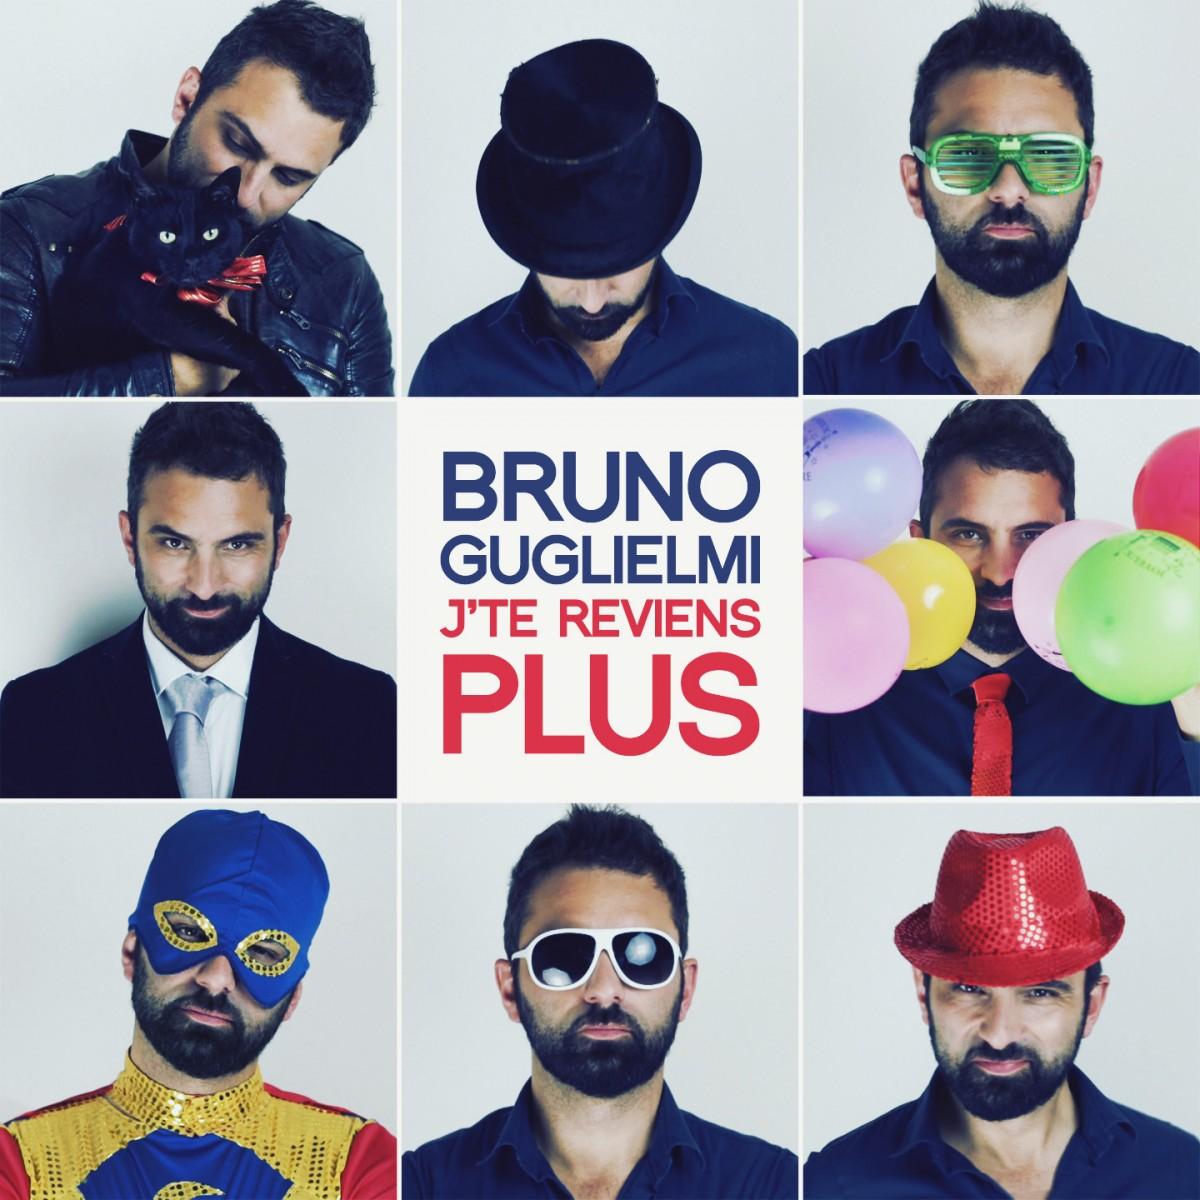 bruno_guglielmi_jte_reviens_plus